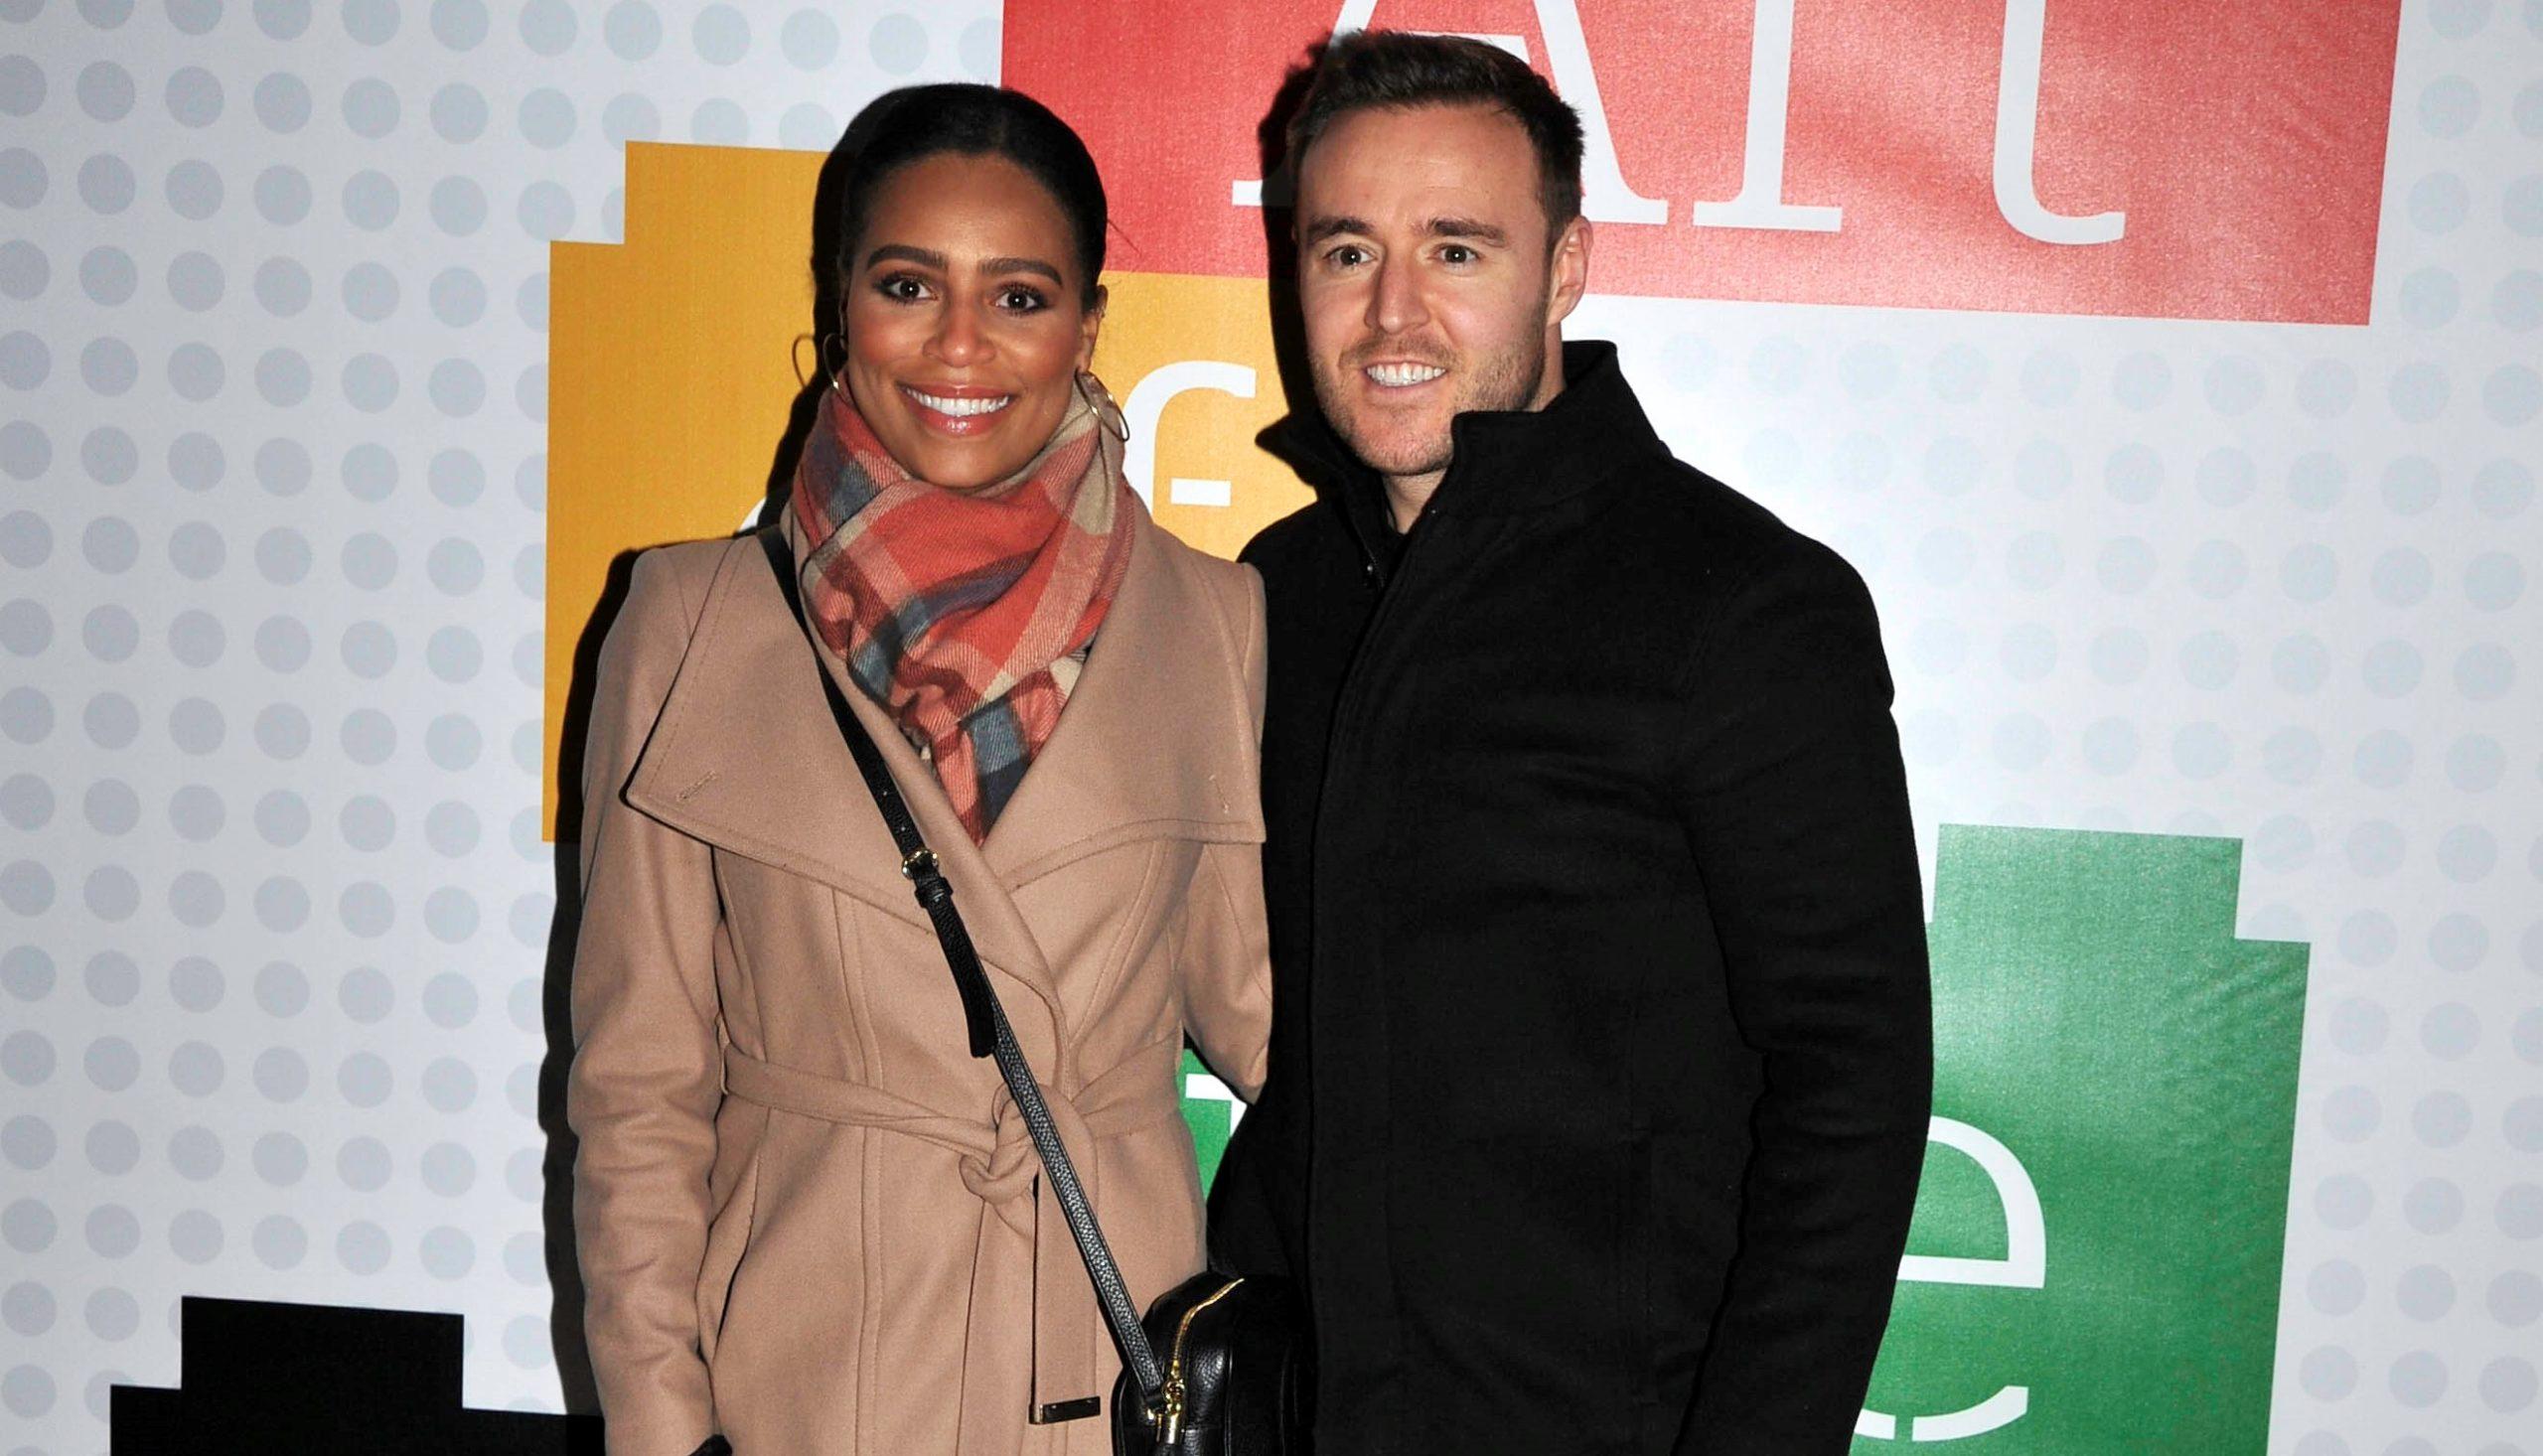 Coronation Street star Alan Halsall gets lockdown haircut from girlfriend Tisha Merry